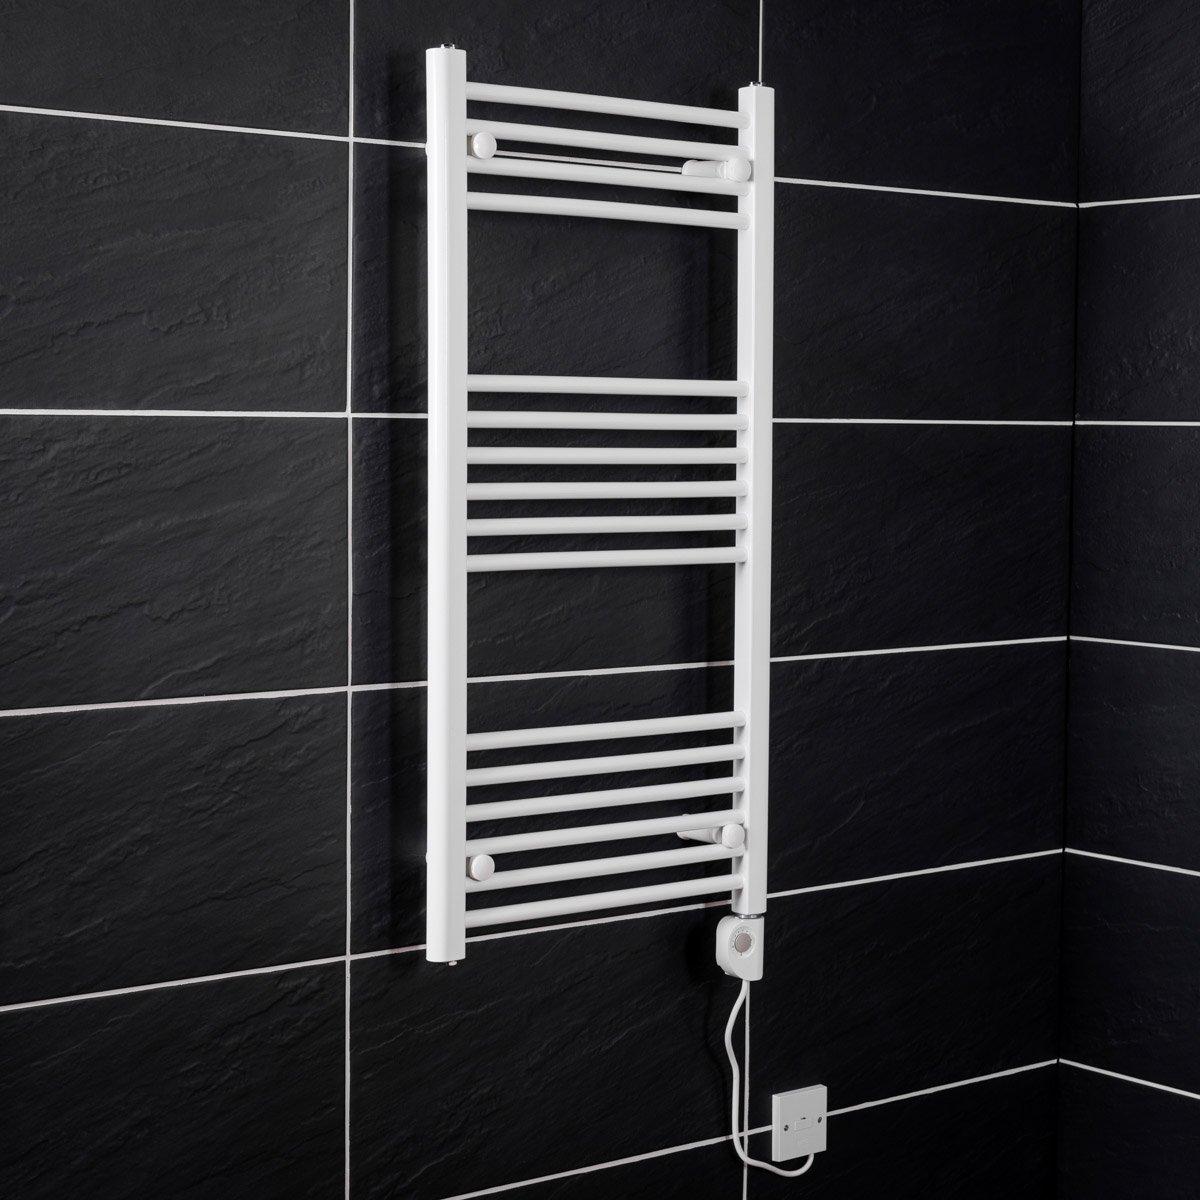 elektrischer handtuchheizk rper elektro badheizk rper bad. Black Bedroom Furniture Sets. Home Design Ideas